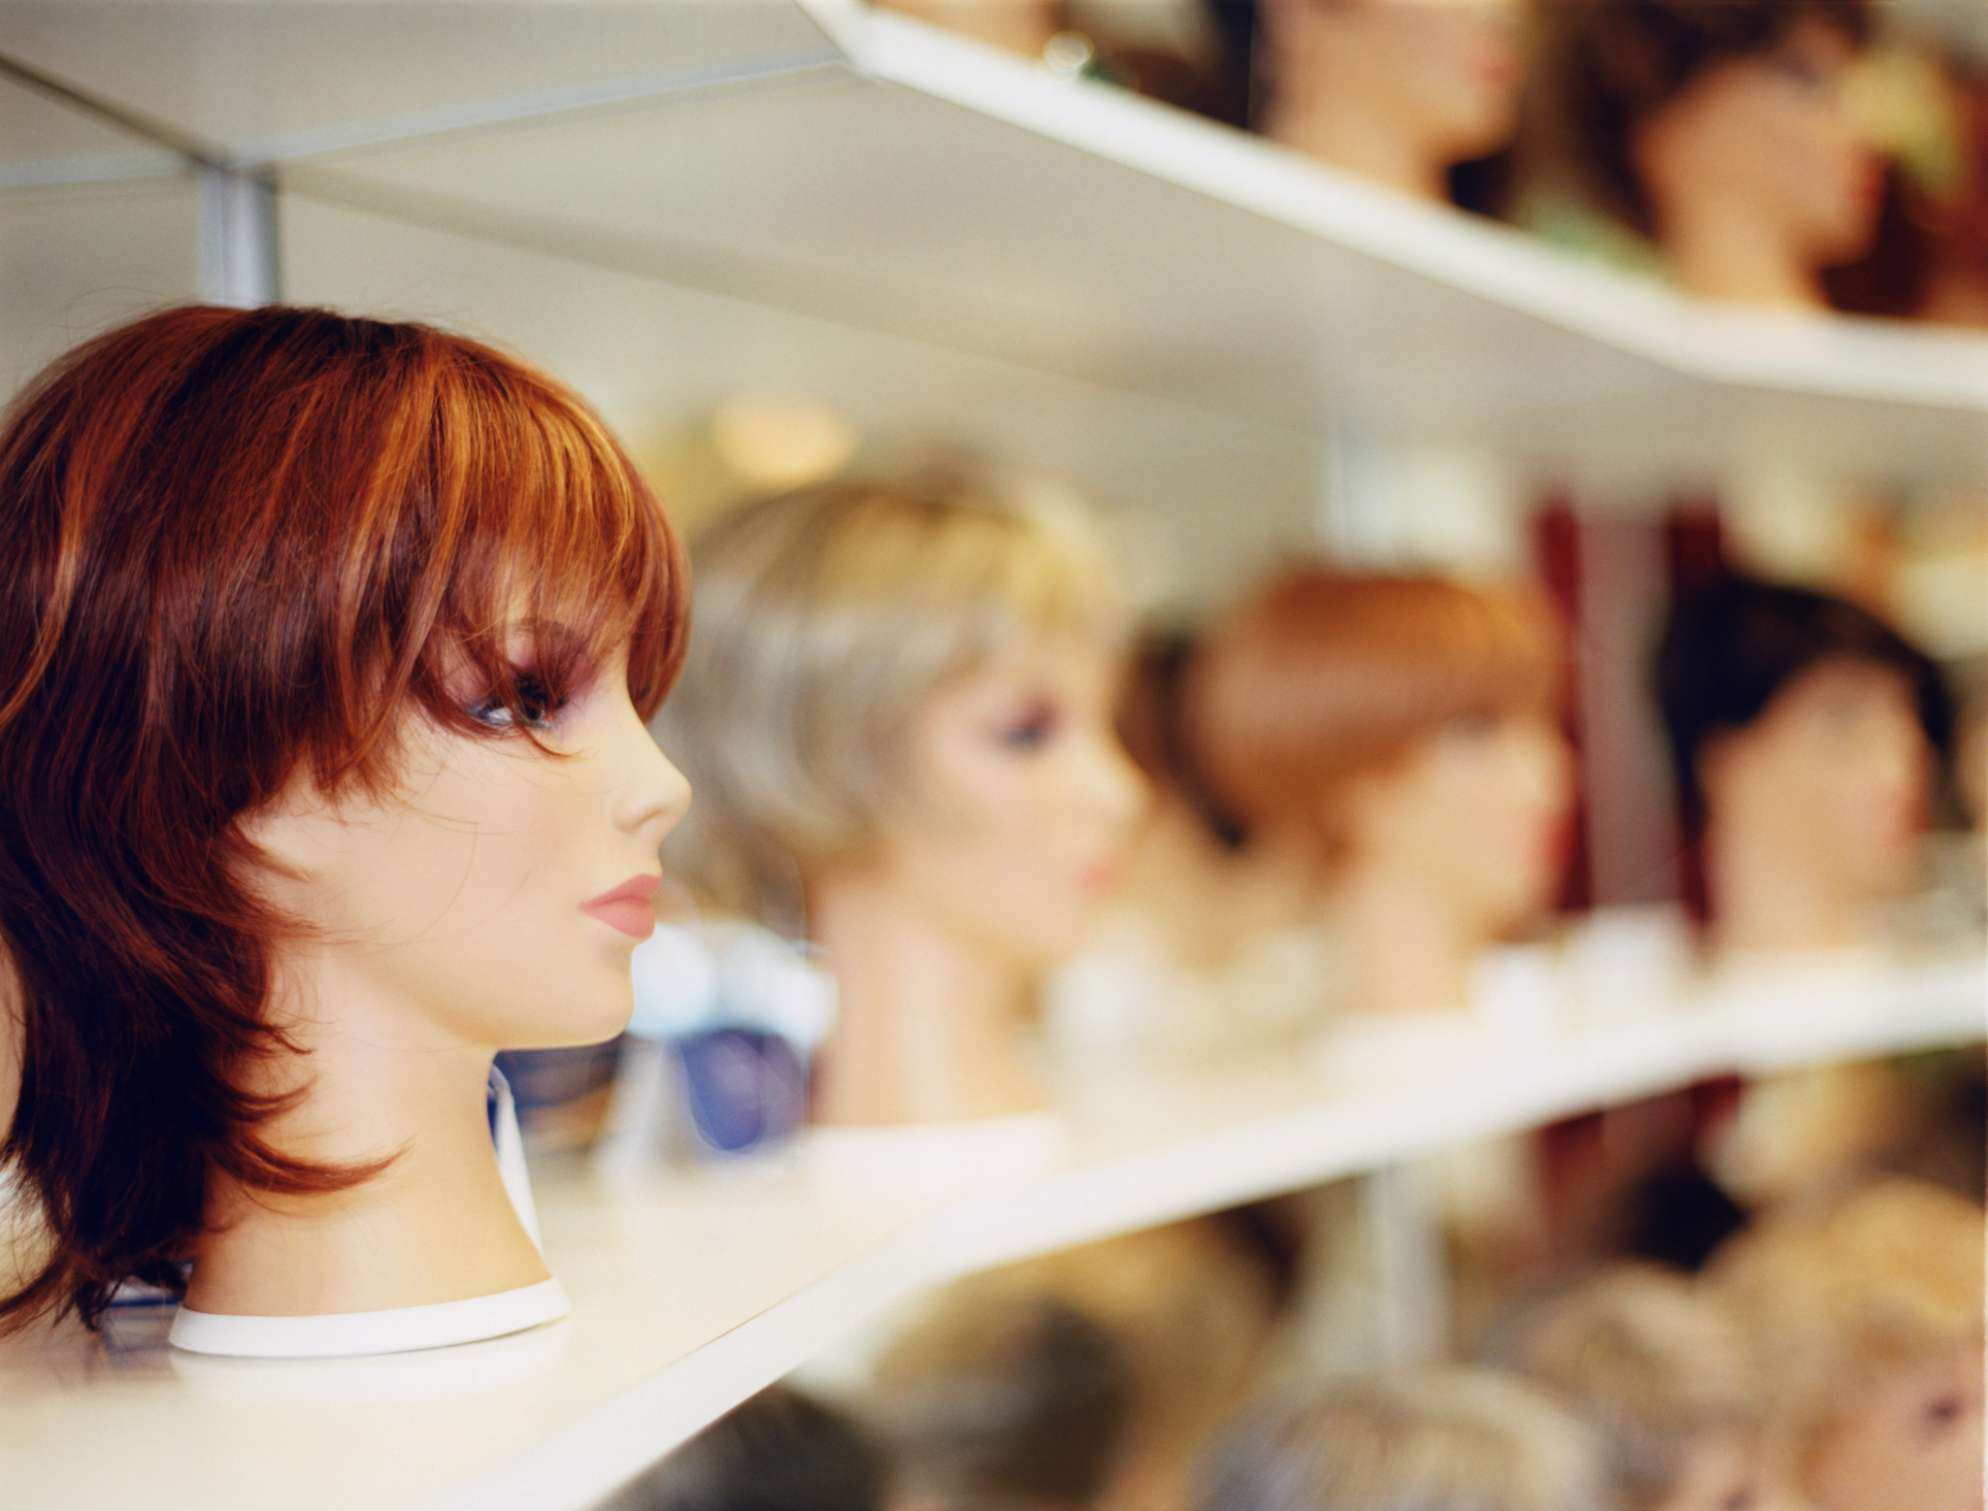 Display in a wig shop